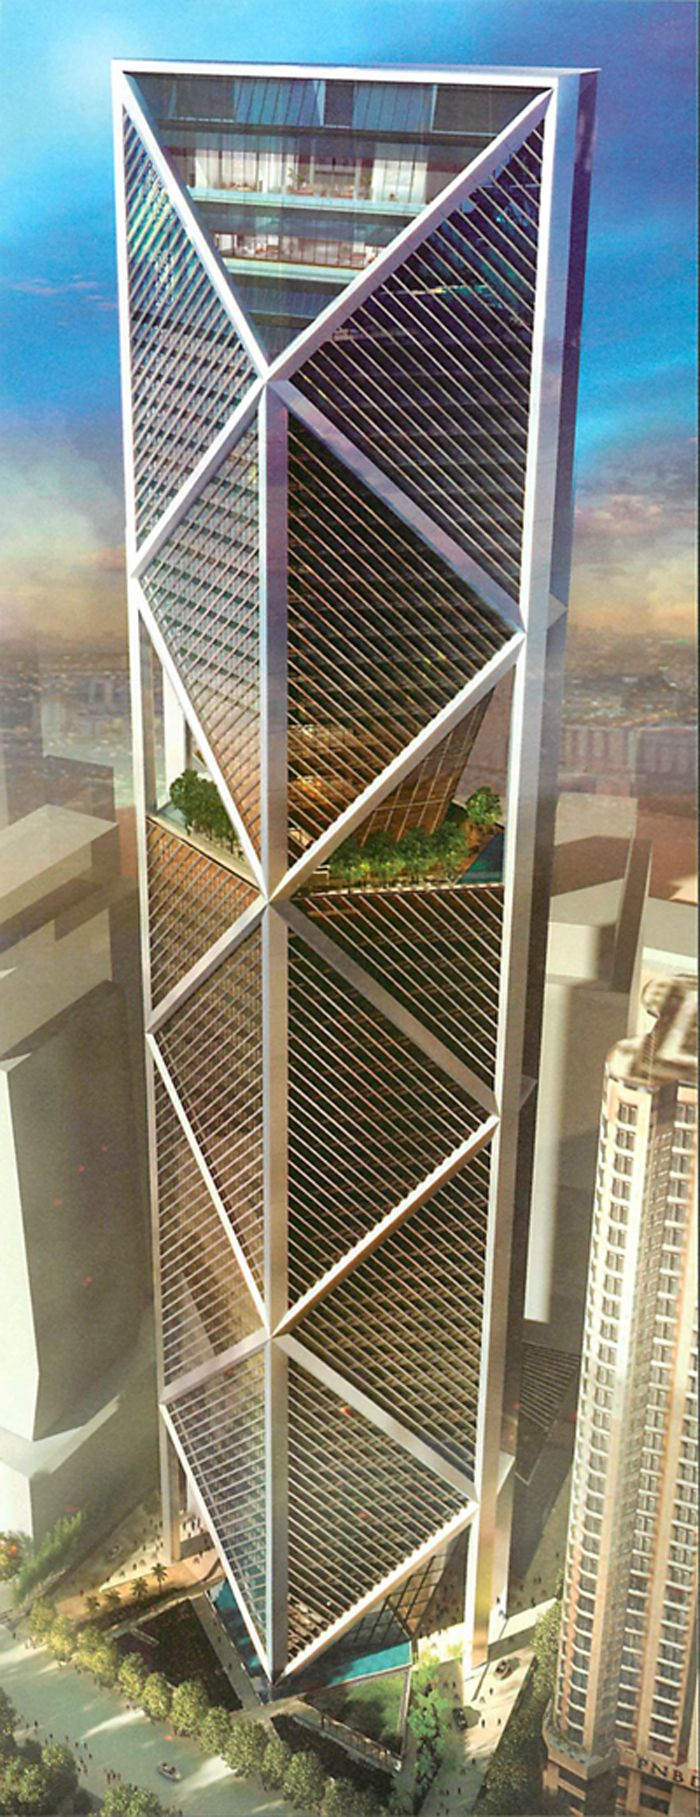 I B TOWER, Kuala Lumpur, Malasya by Foster + Partners Architecture :: 62 floors, height 298m